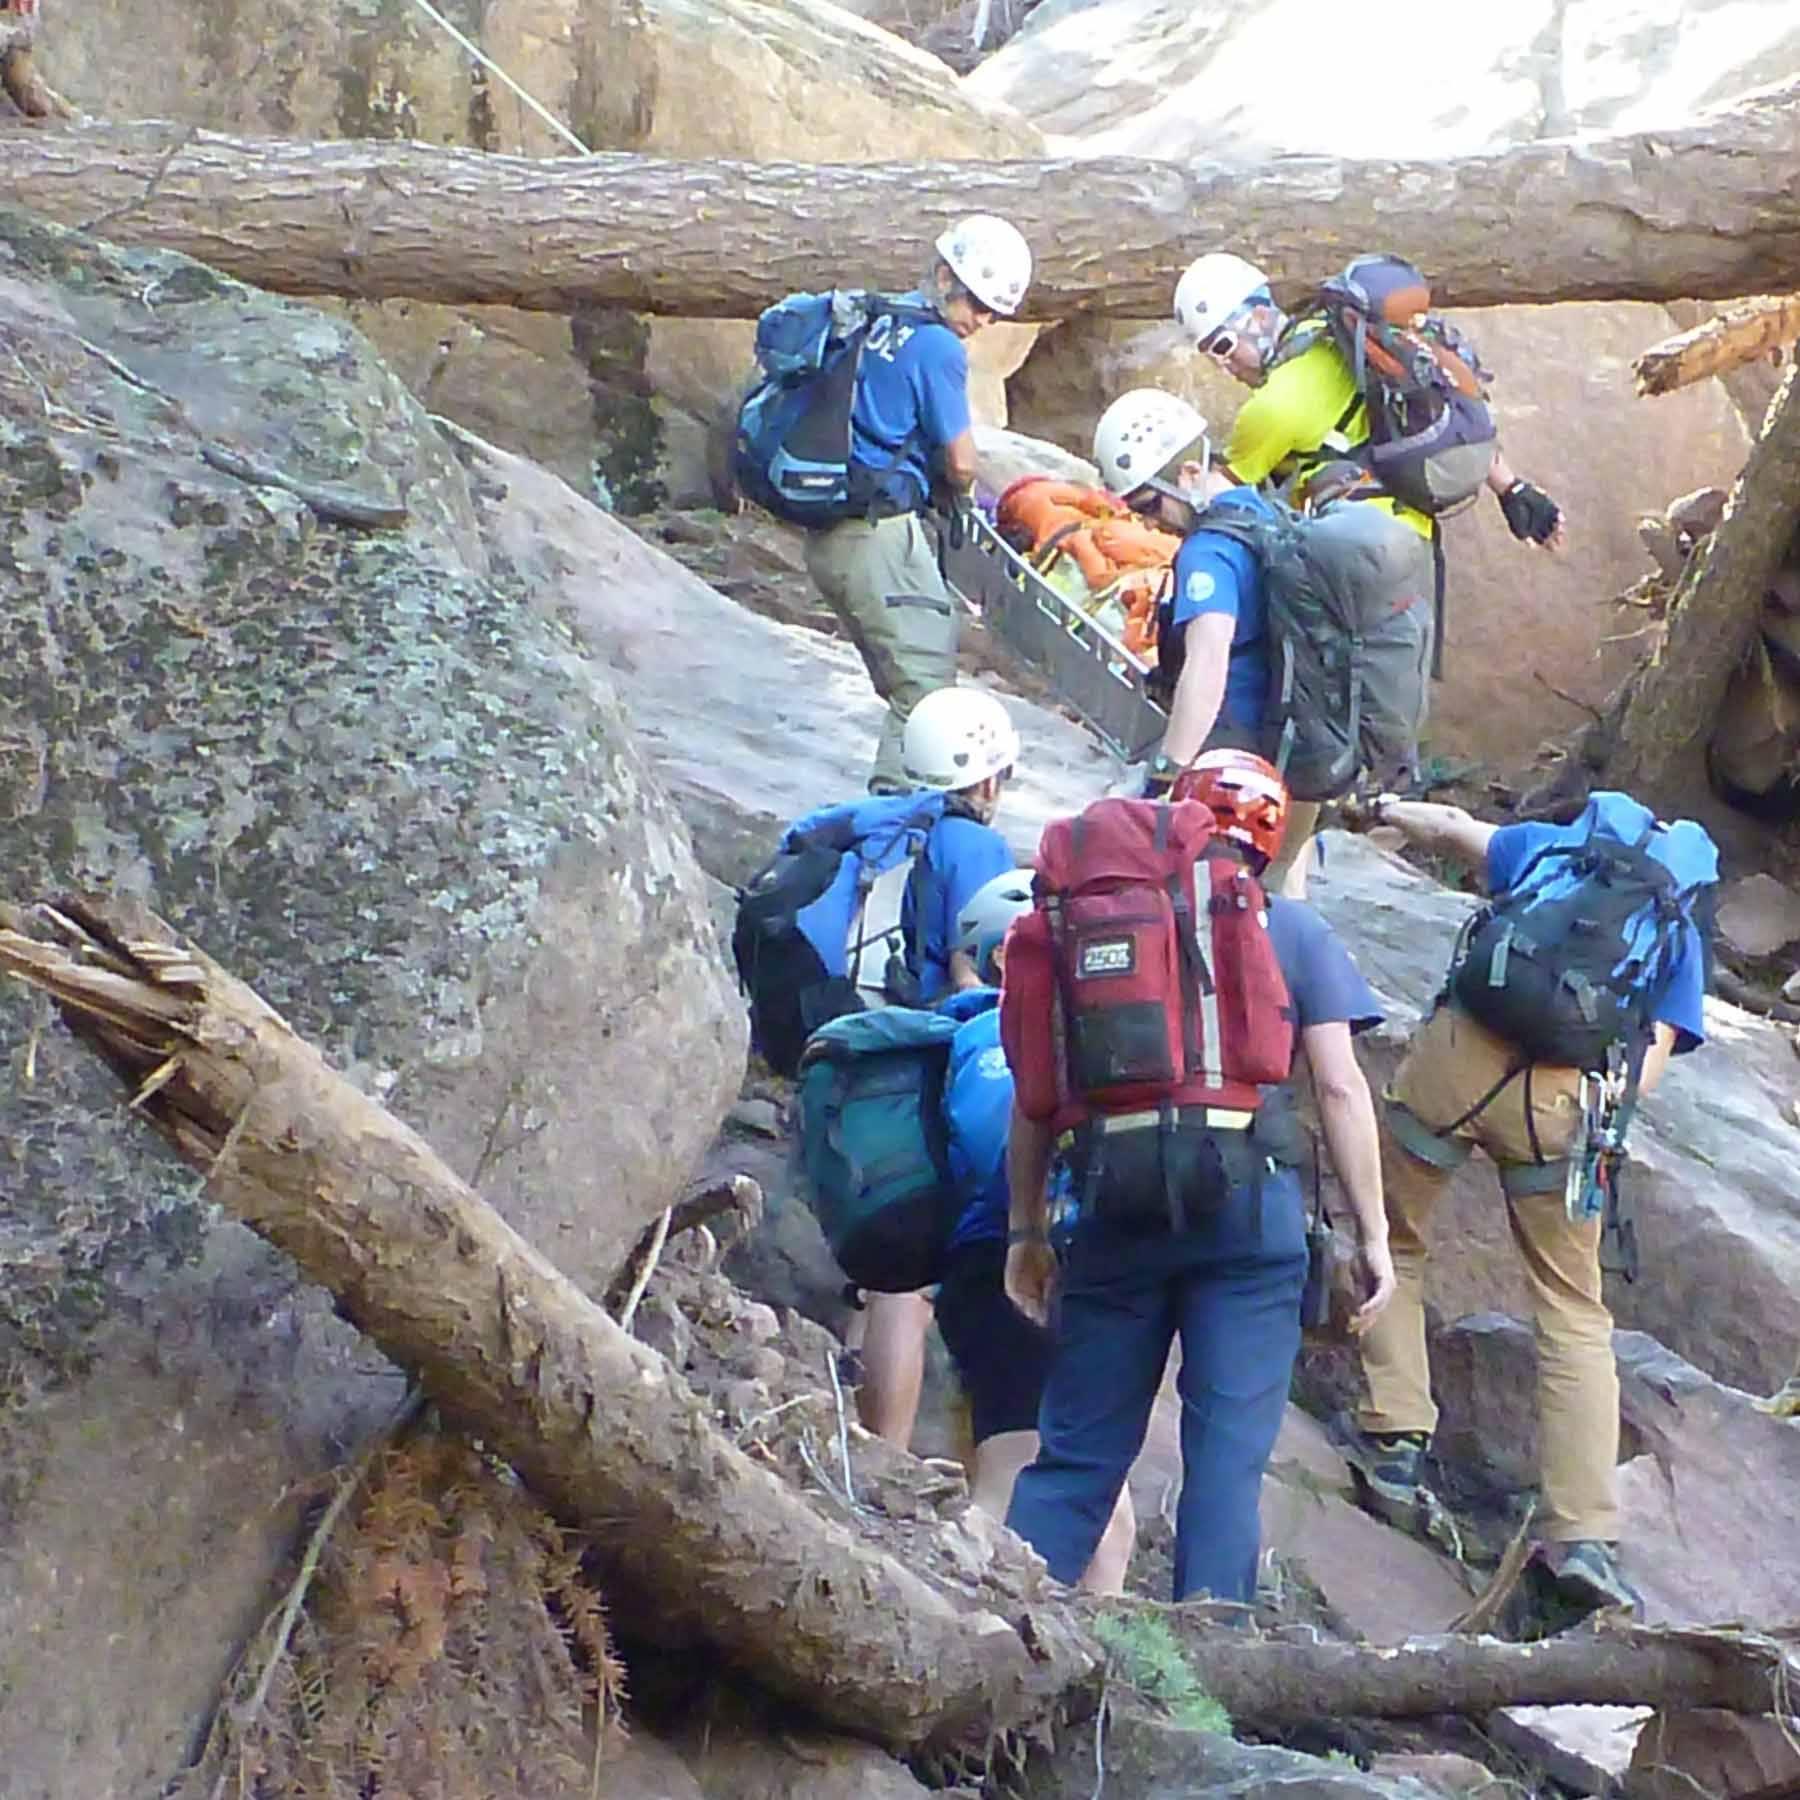 RMRG members conduct a litter evacuation down rugged, flood eroded terrain below the eastface of Boulder's2nd Flatiron.